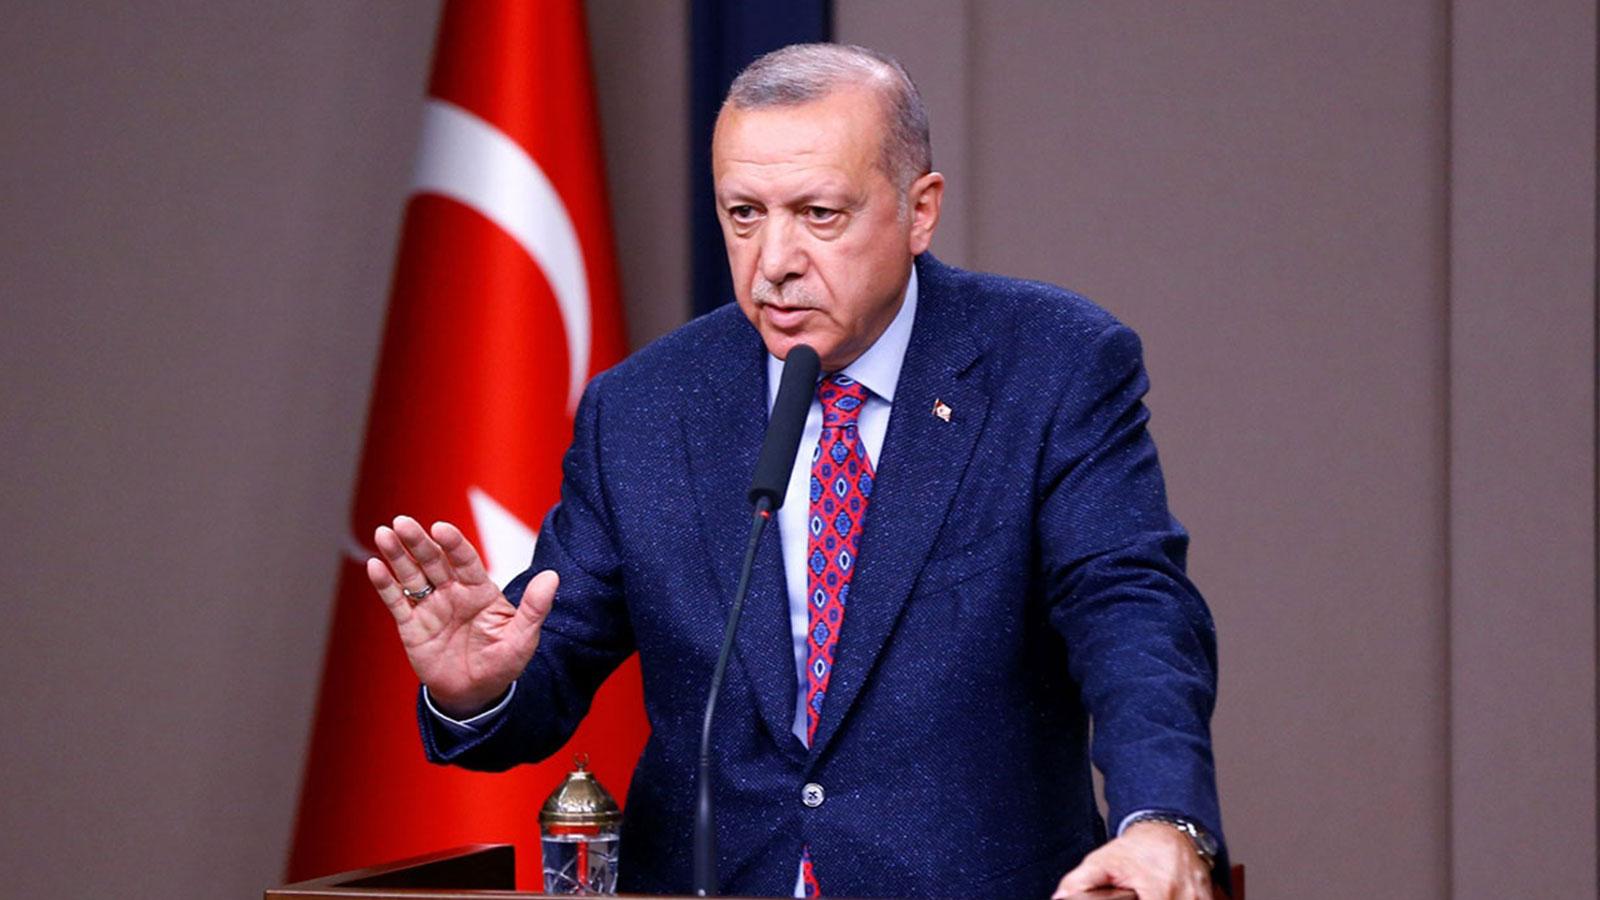 cumhurbaskani-erdogandan-flas-merkez-bankasi-aciklamasi